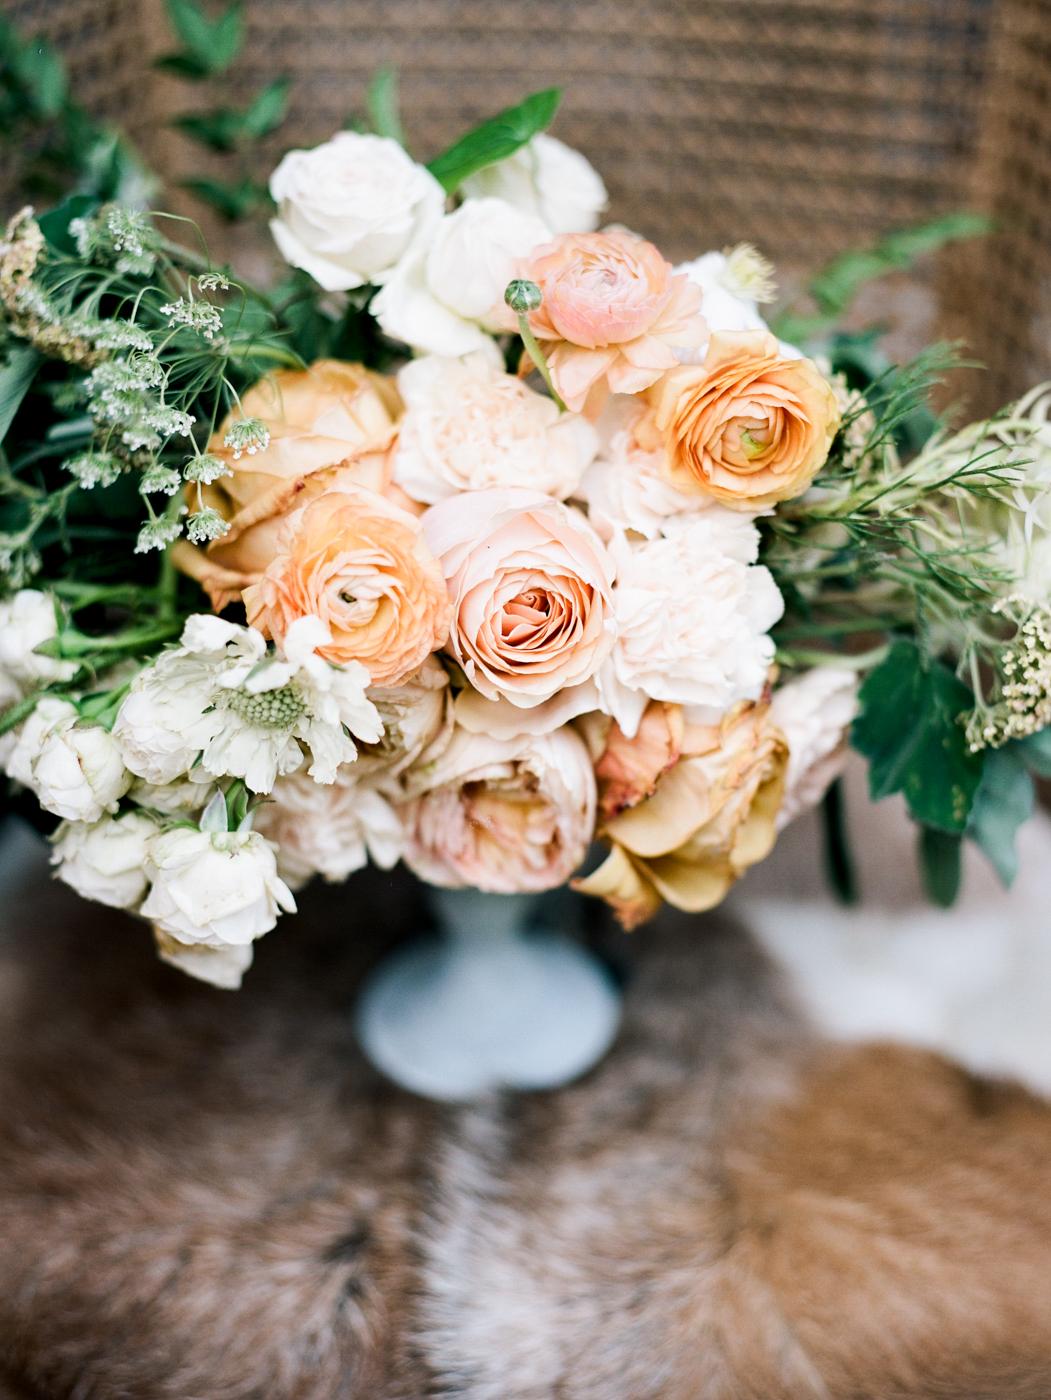 Savannah wedding flowers florist ranunculus roses